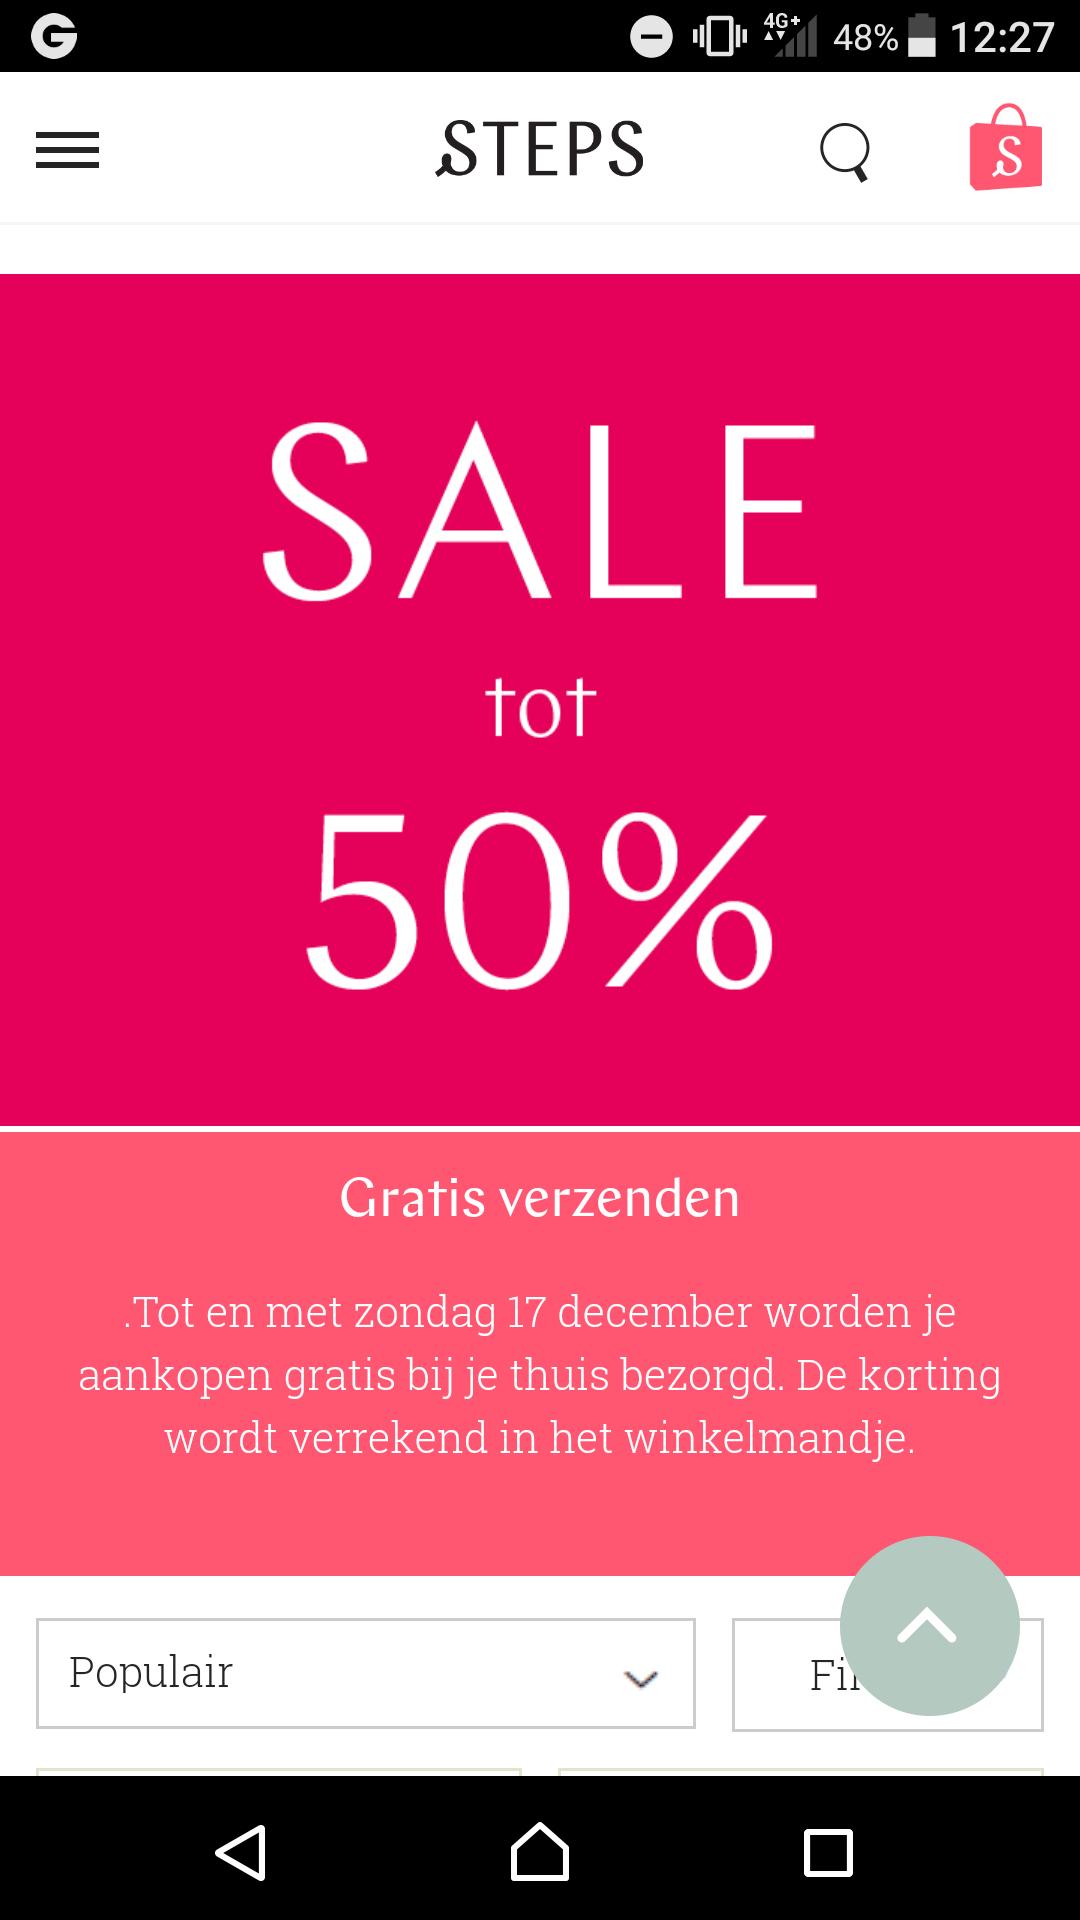 Steps tot 50% korting en gratis verzending tm zondag 17 december